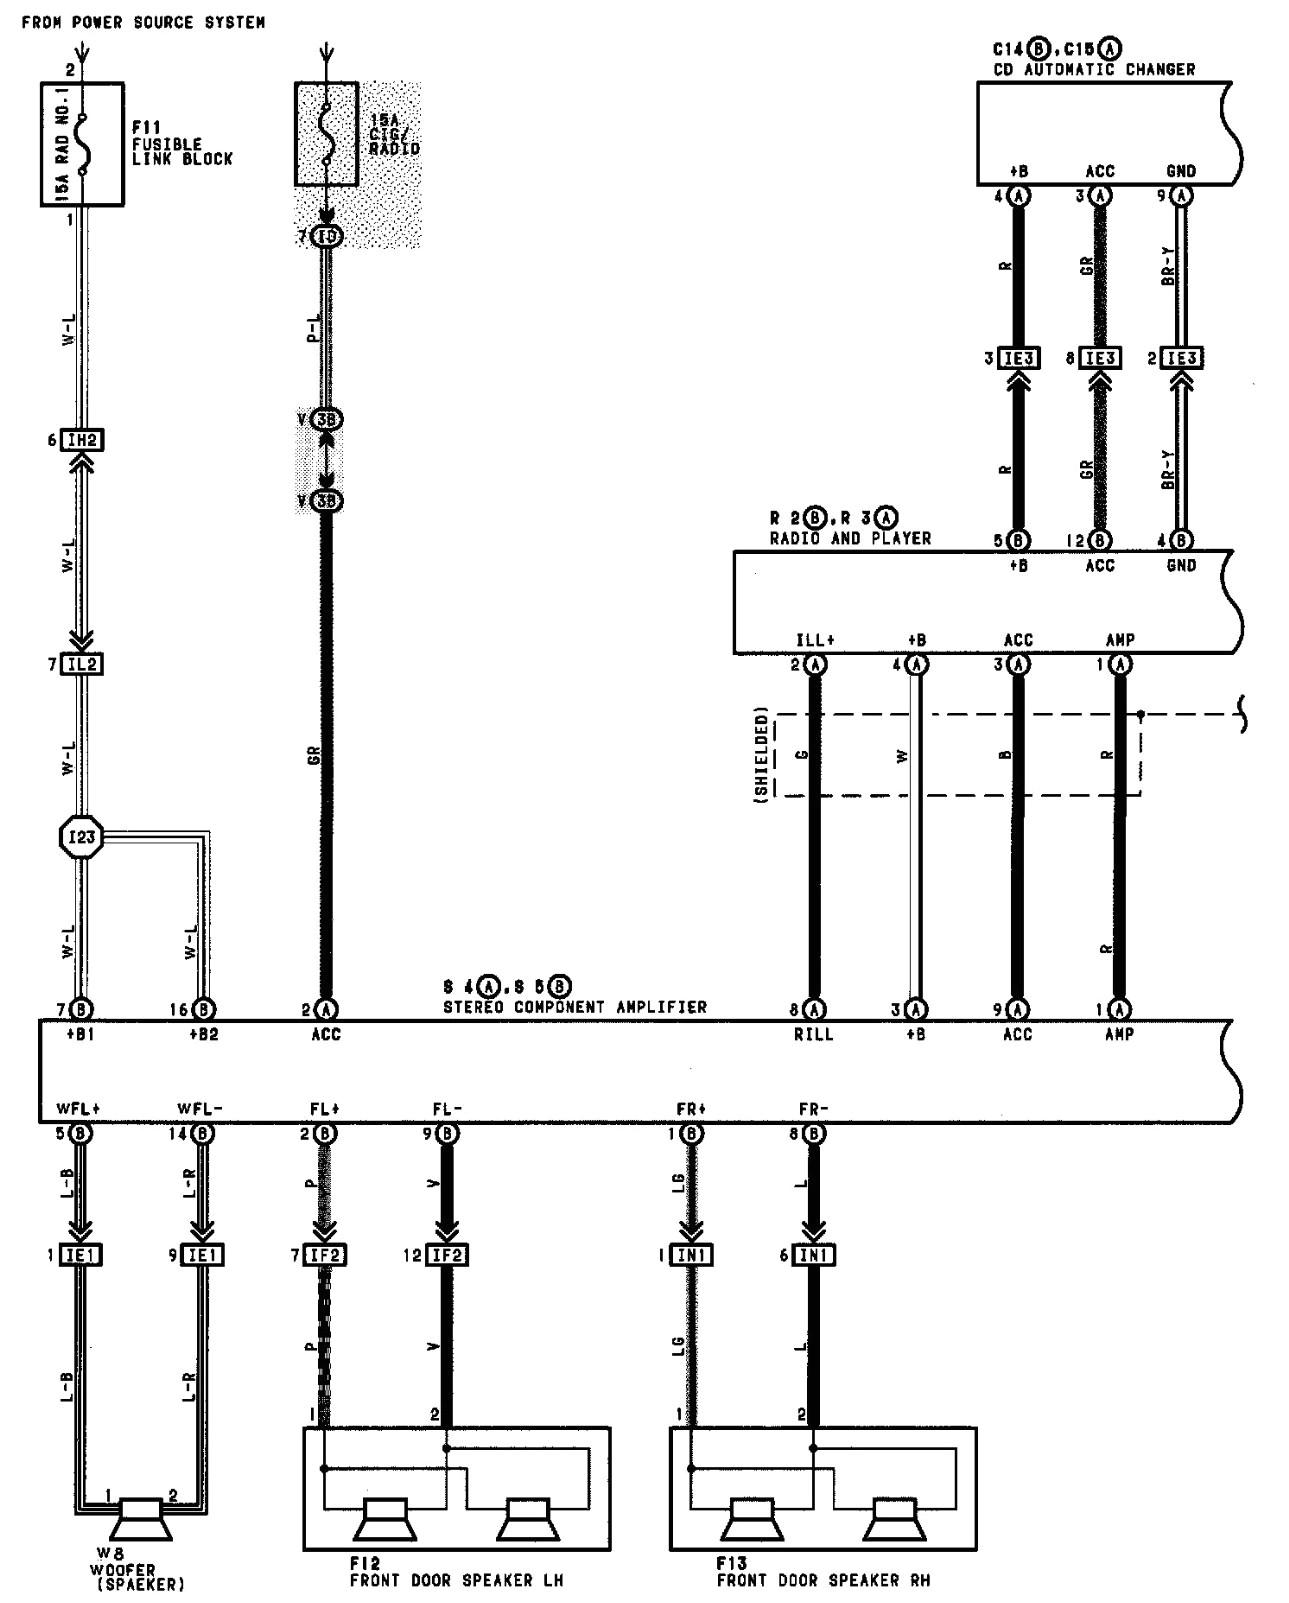 venza wiring diagram diagram database reg toyota venza radio wiring diagram free wiring schematics toyota venza